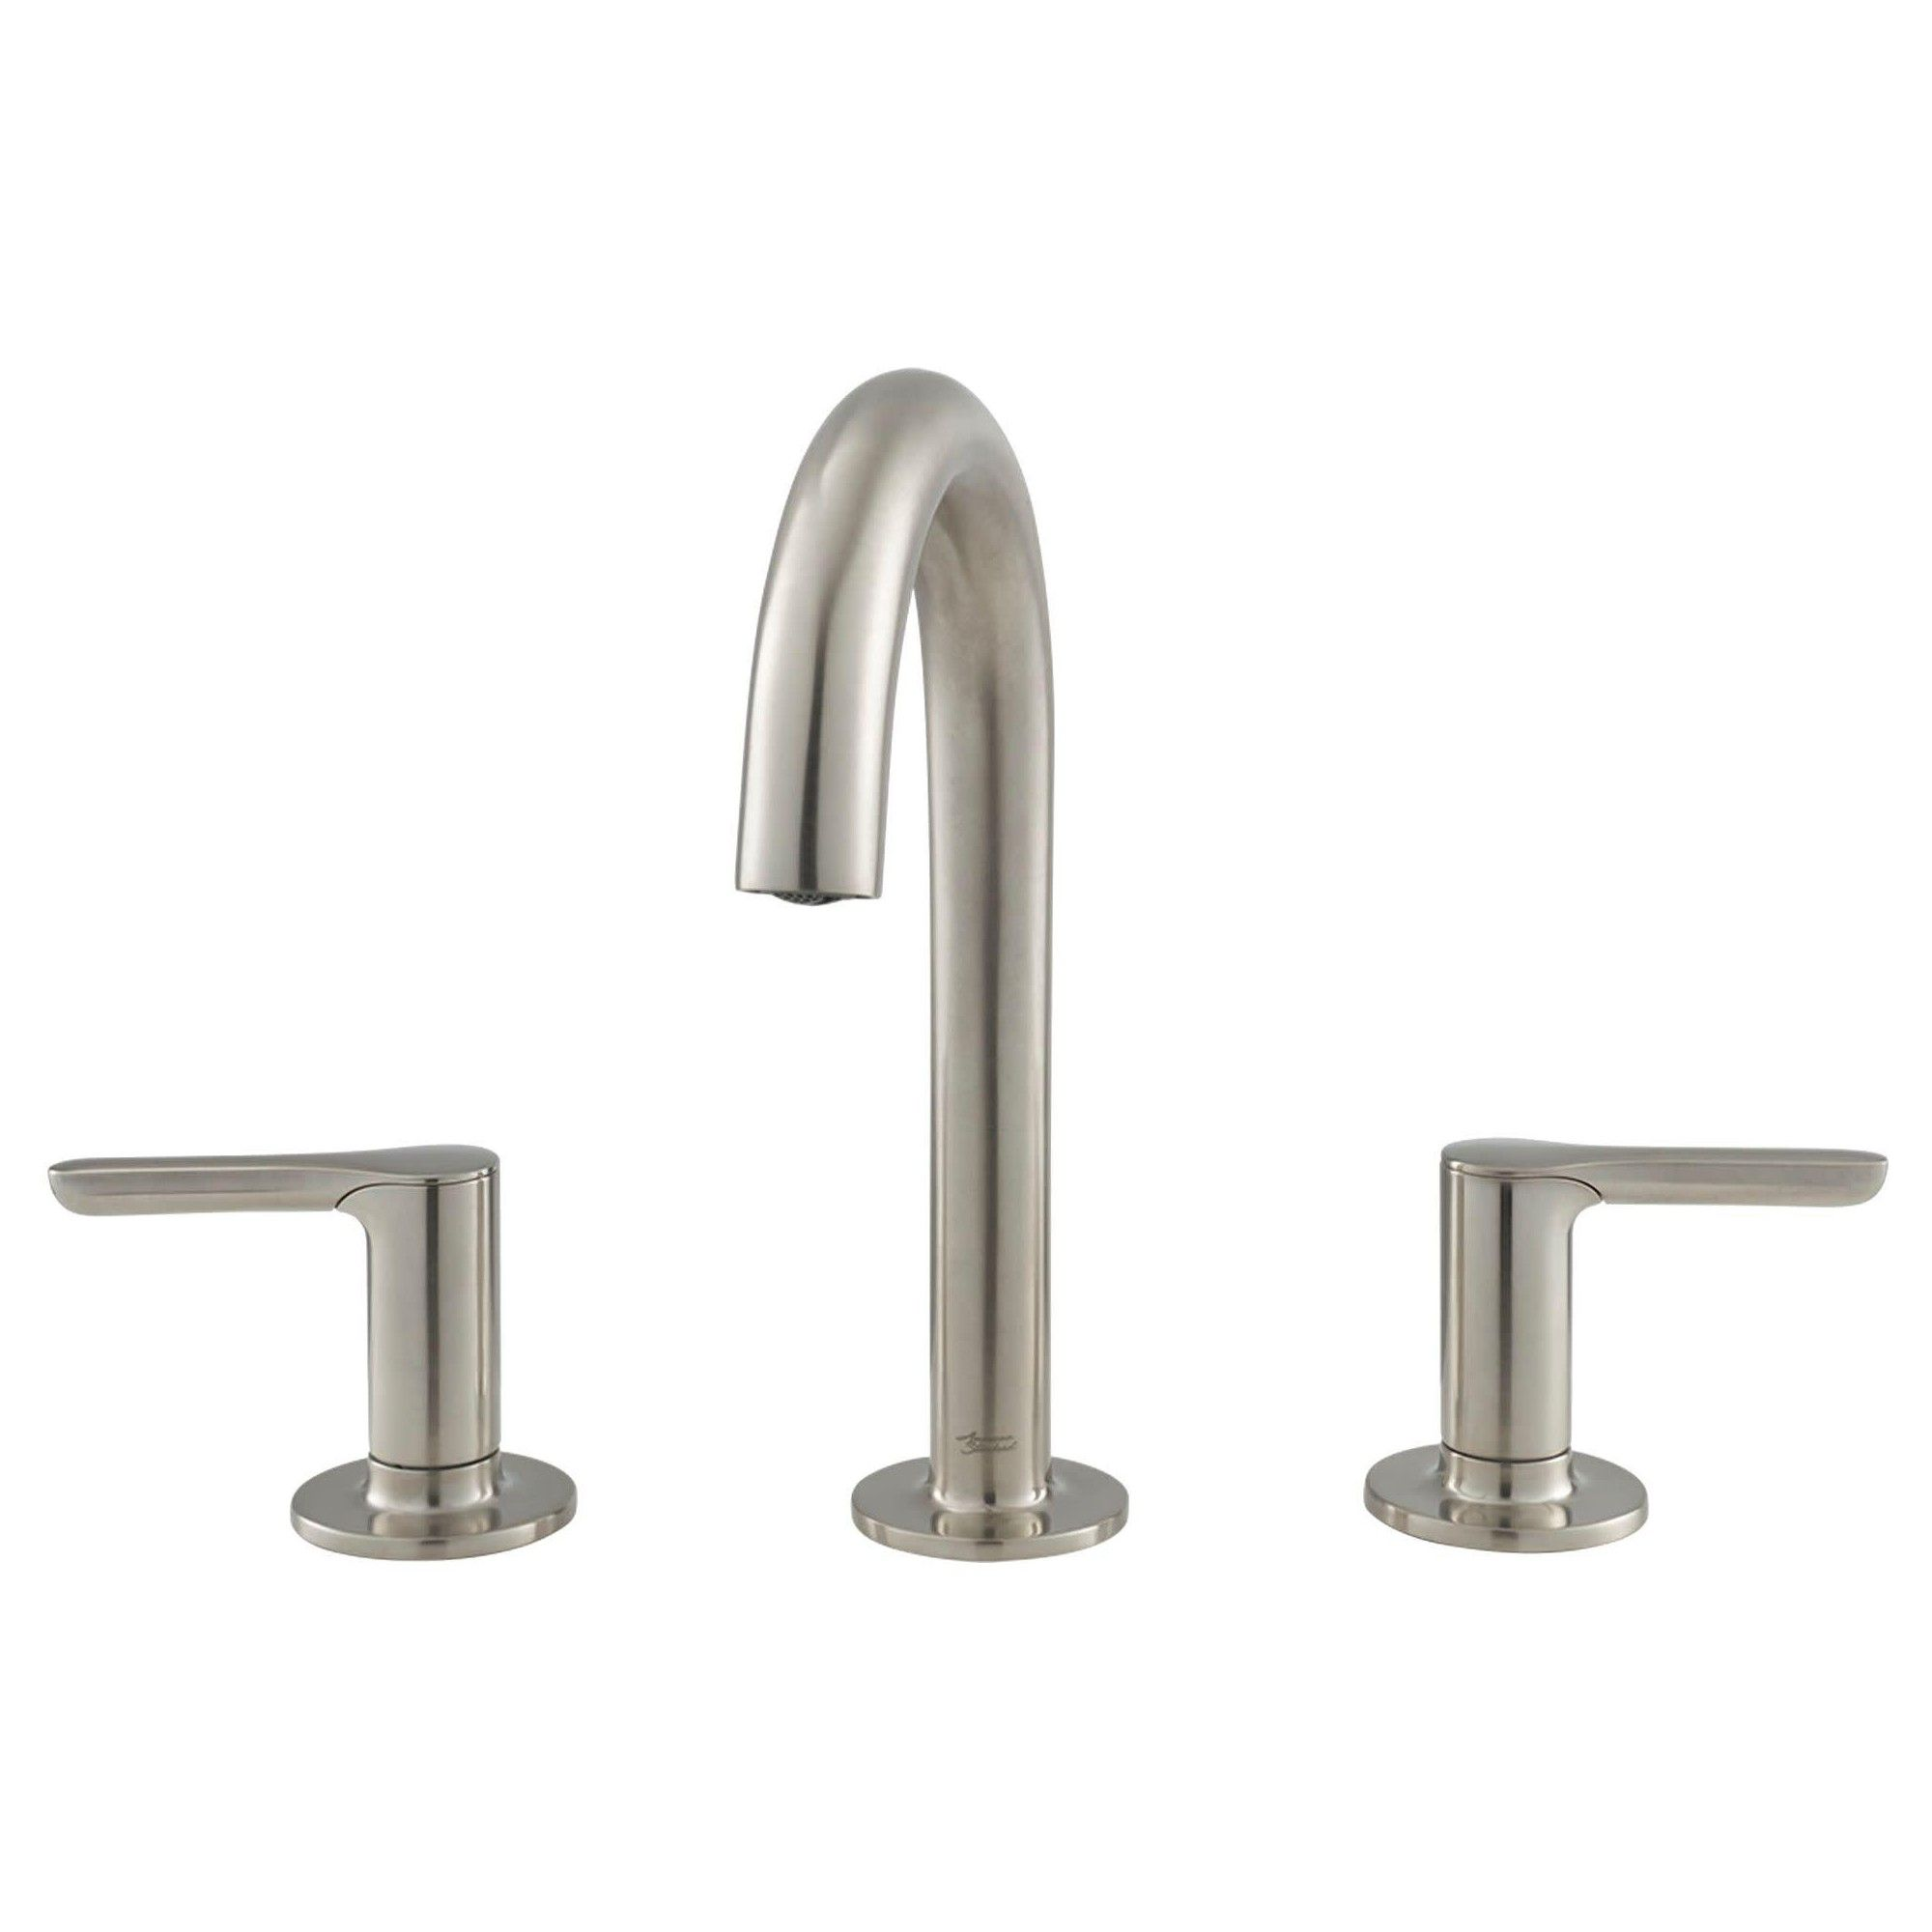 American Standard 7105 801 Studio S 1 2 Gpm Widespread Bathroom